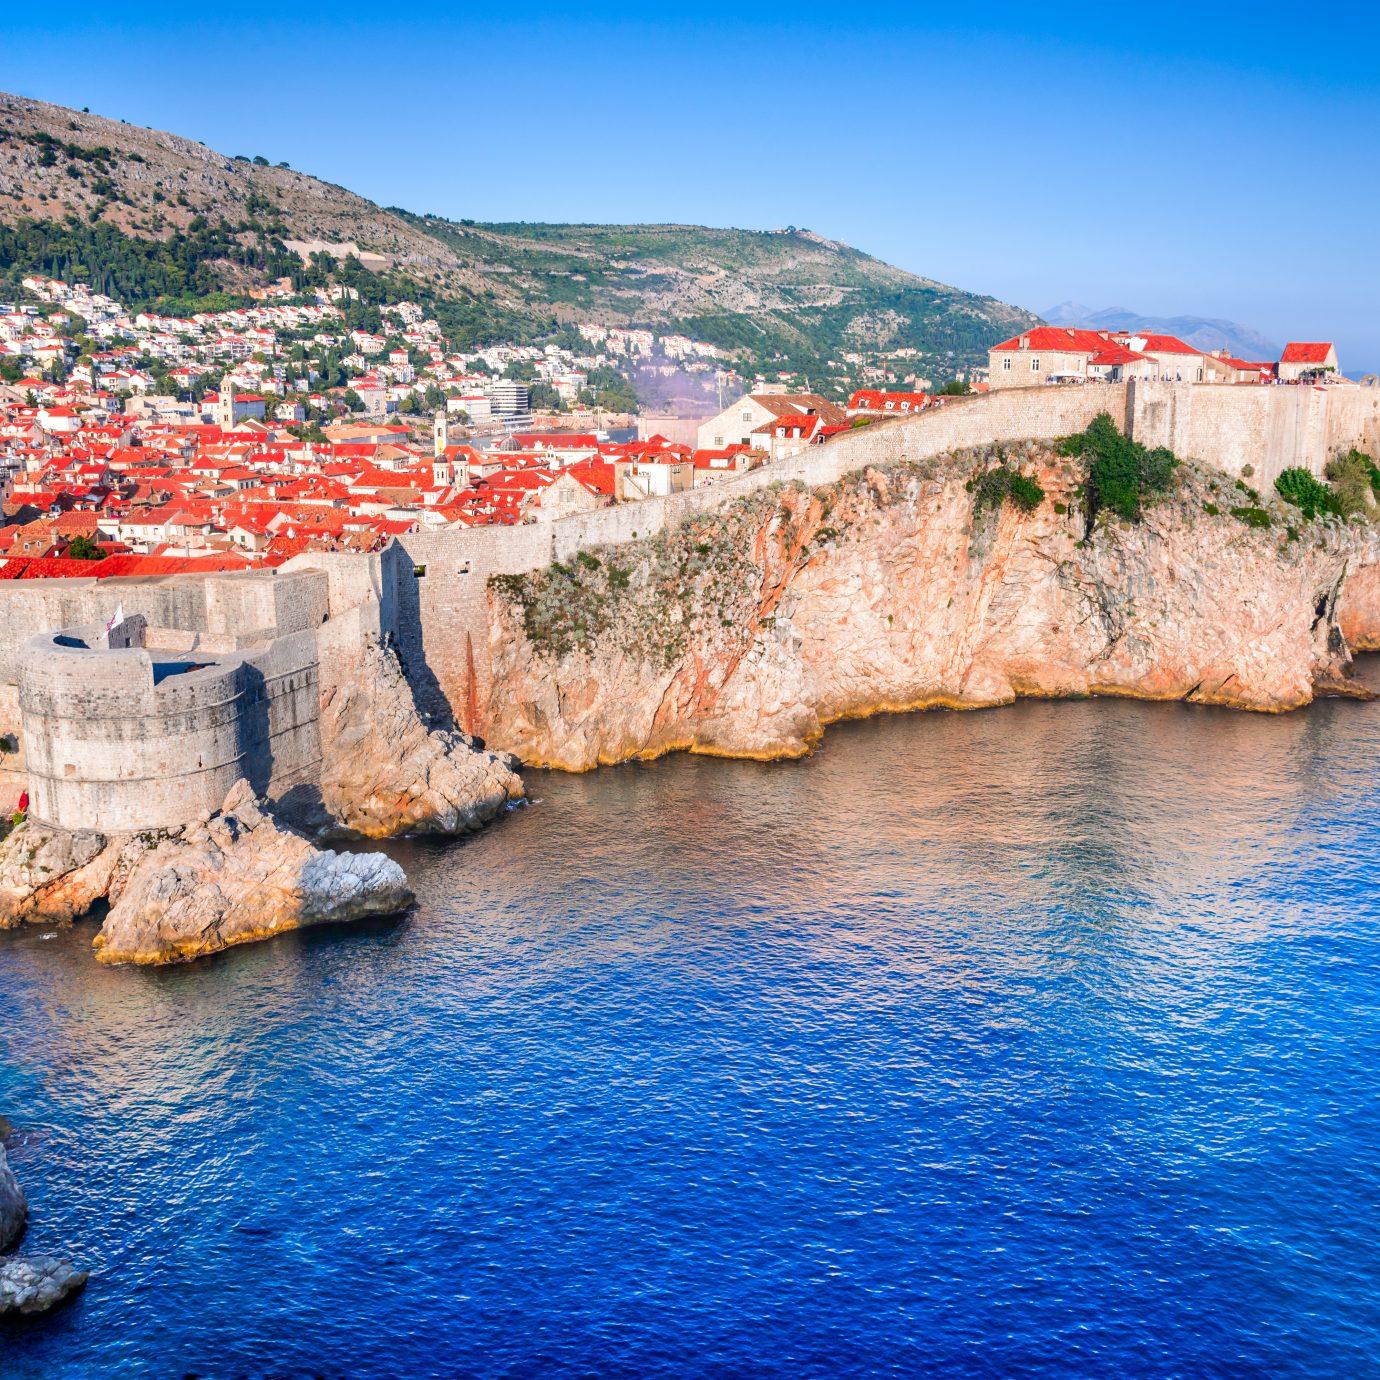 Dubrovnik, Croatia - Sunset summer light on medieval walled city of Ragusa, Dalmatia.